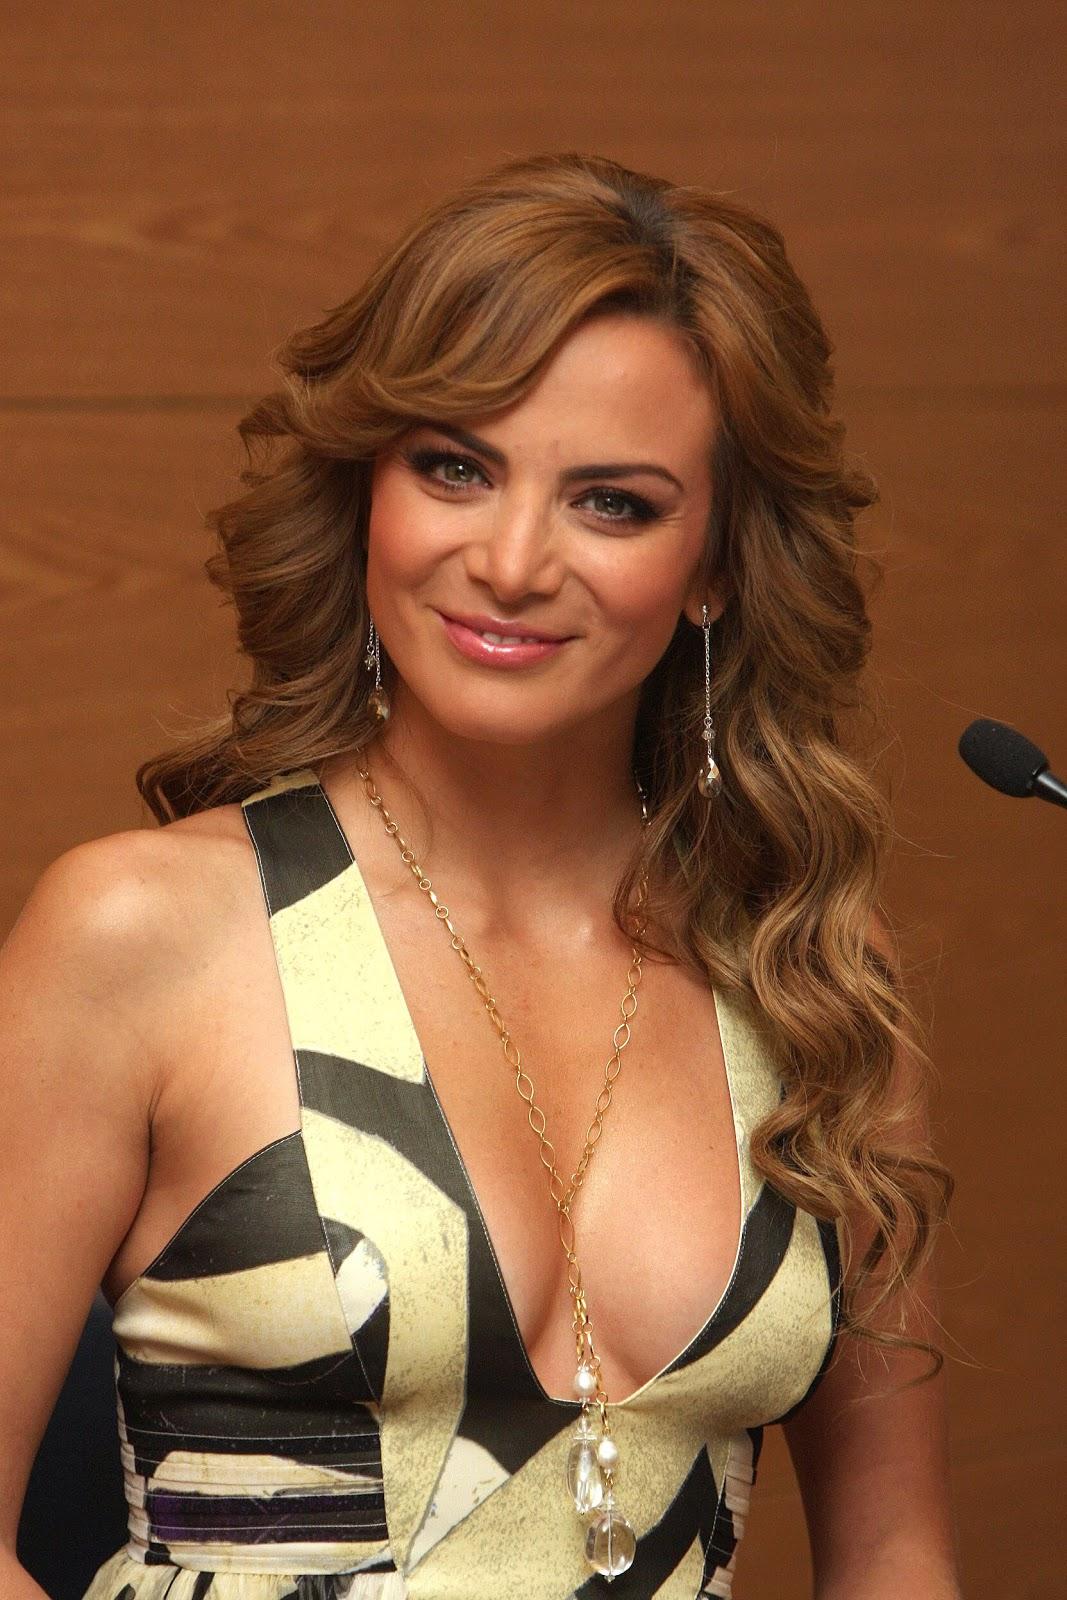 ... la actriz principal de las telenovelas mas exitosas en brasil avenida